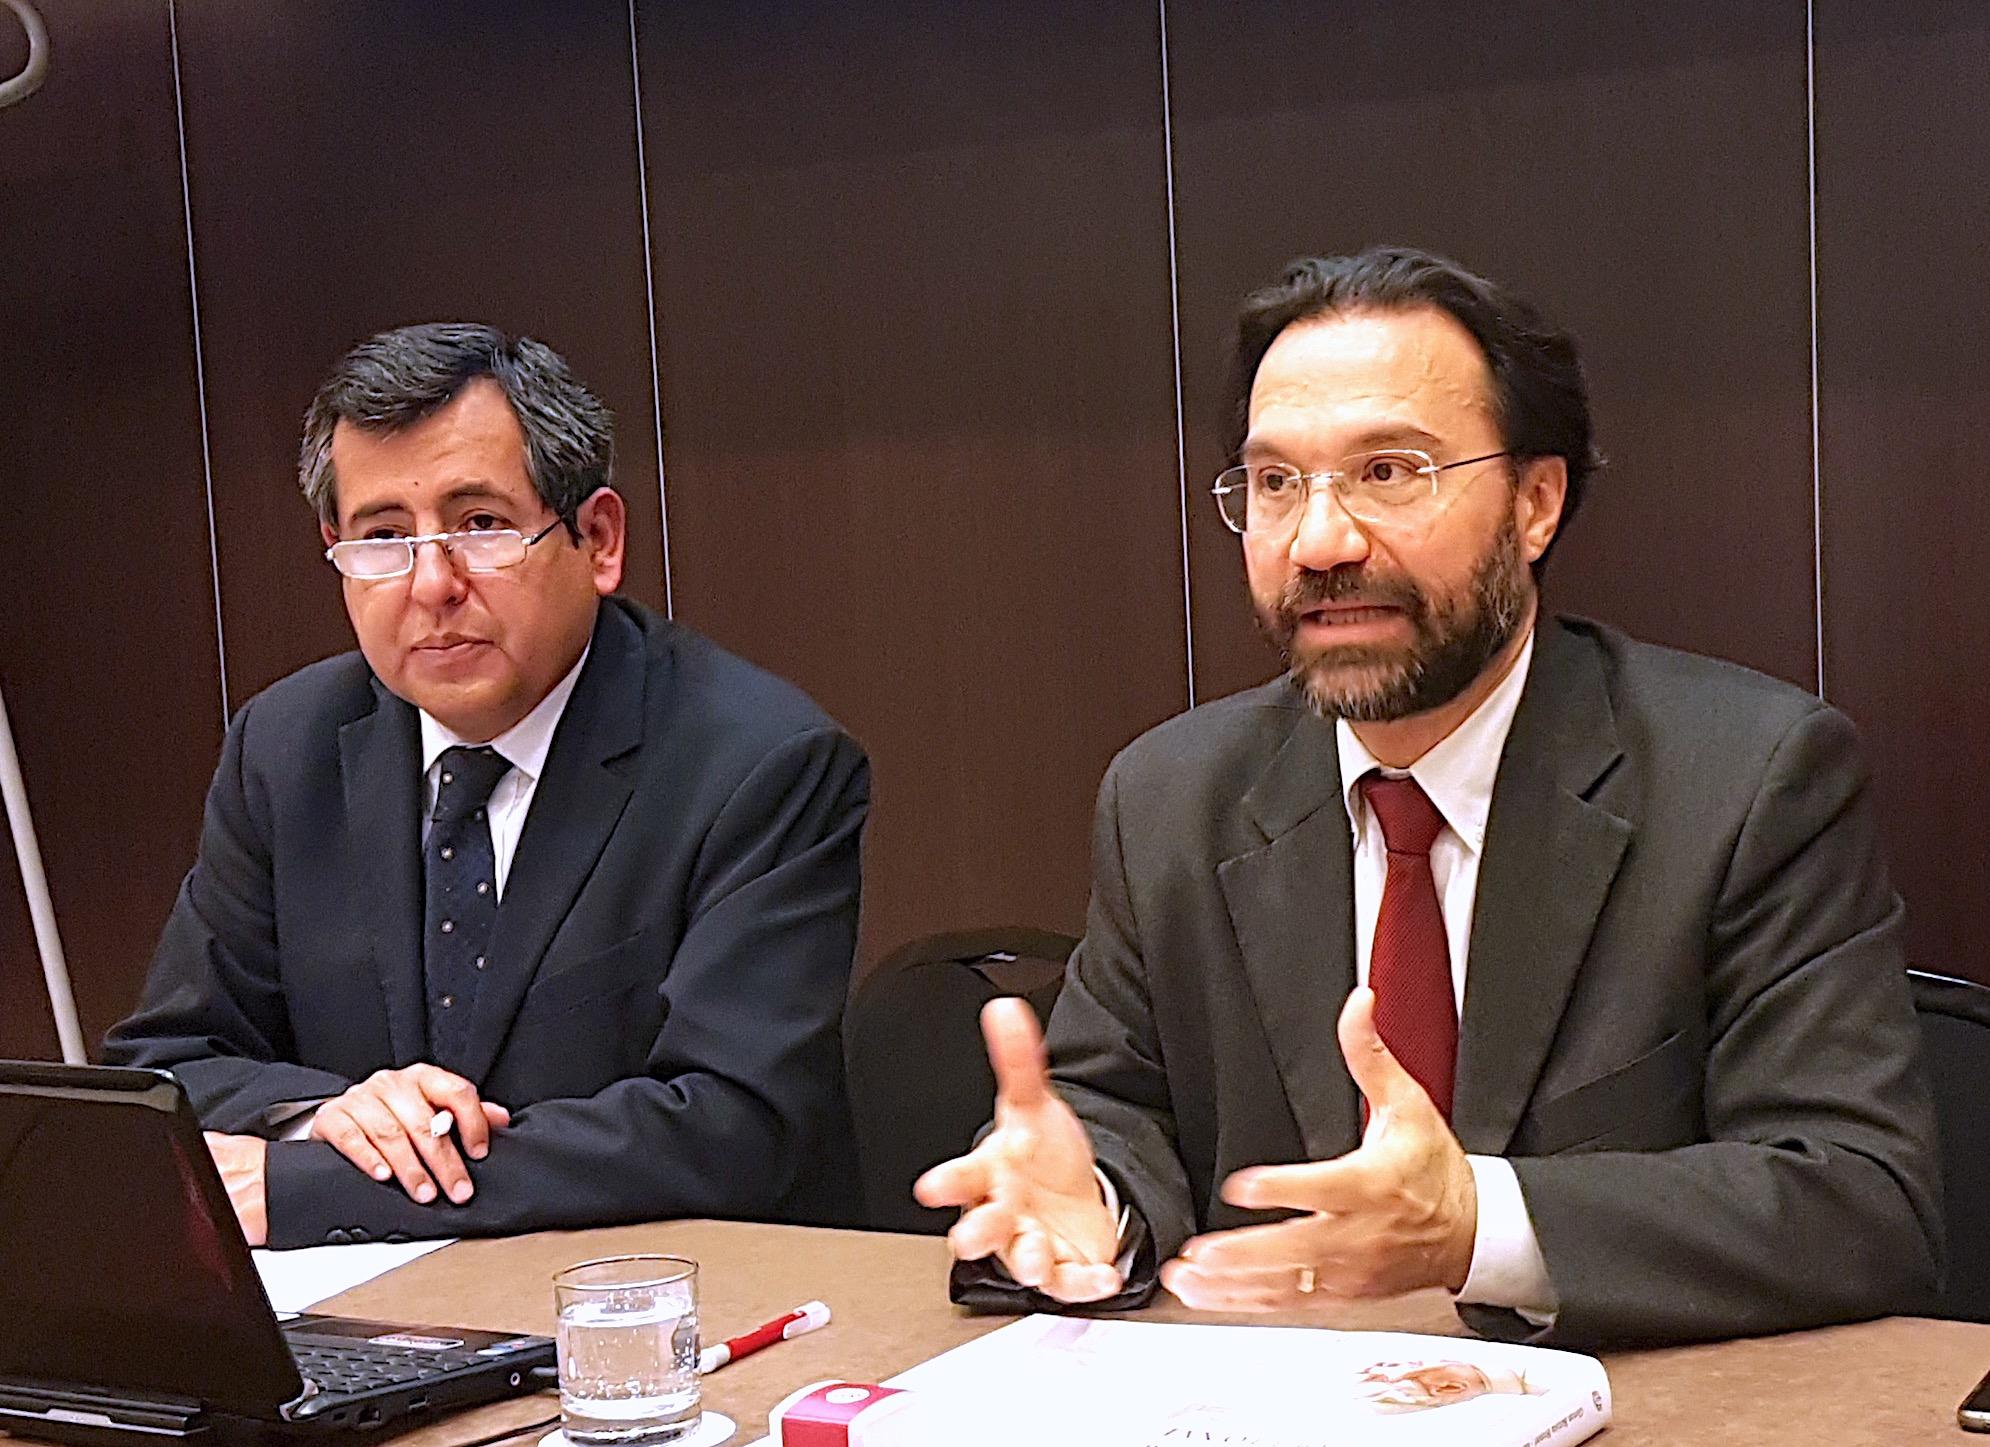 El vaticanista RAI Giovan Battista Brunori